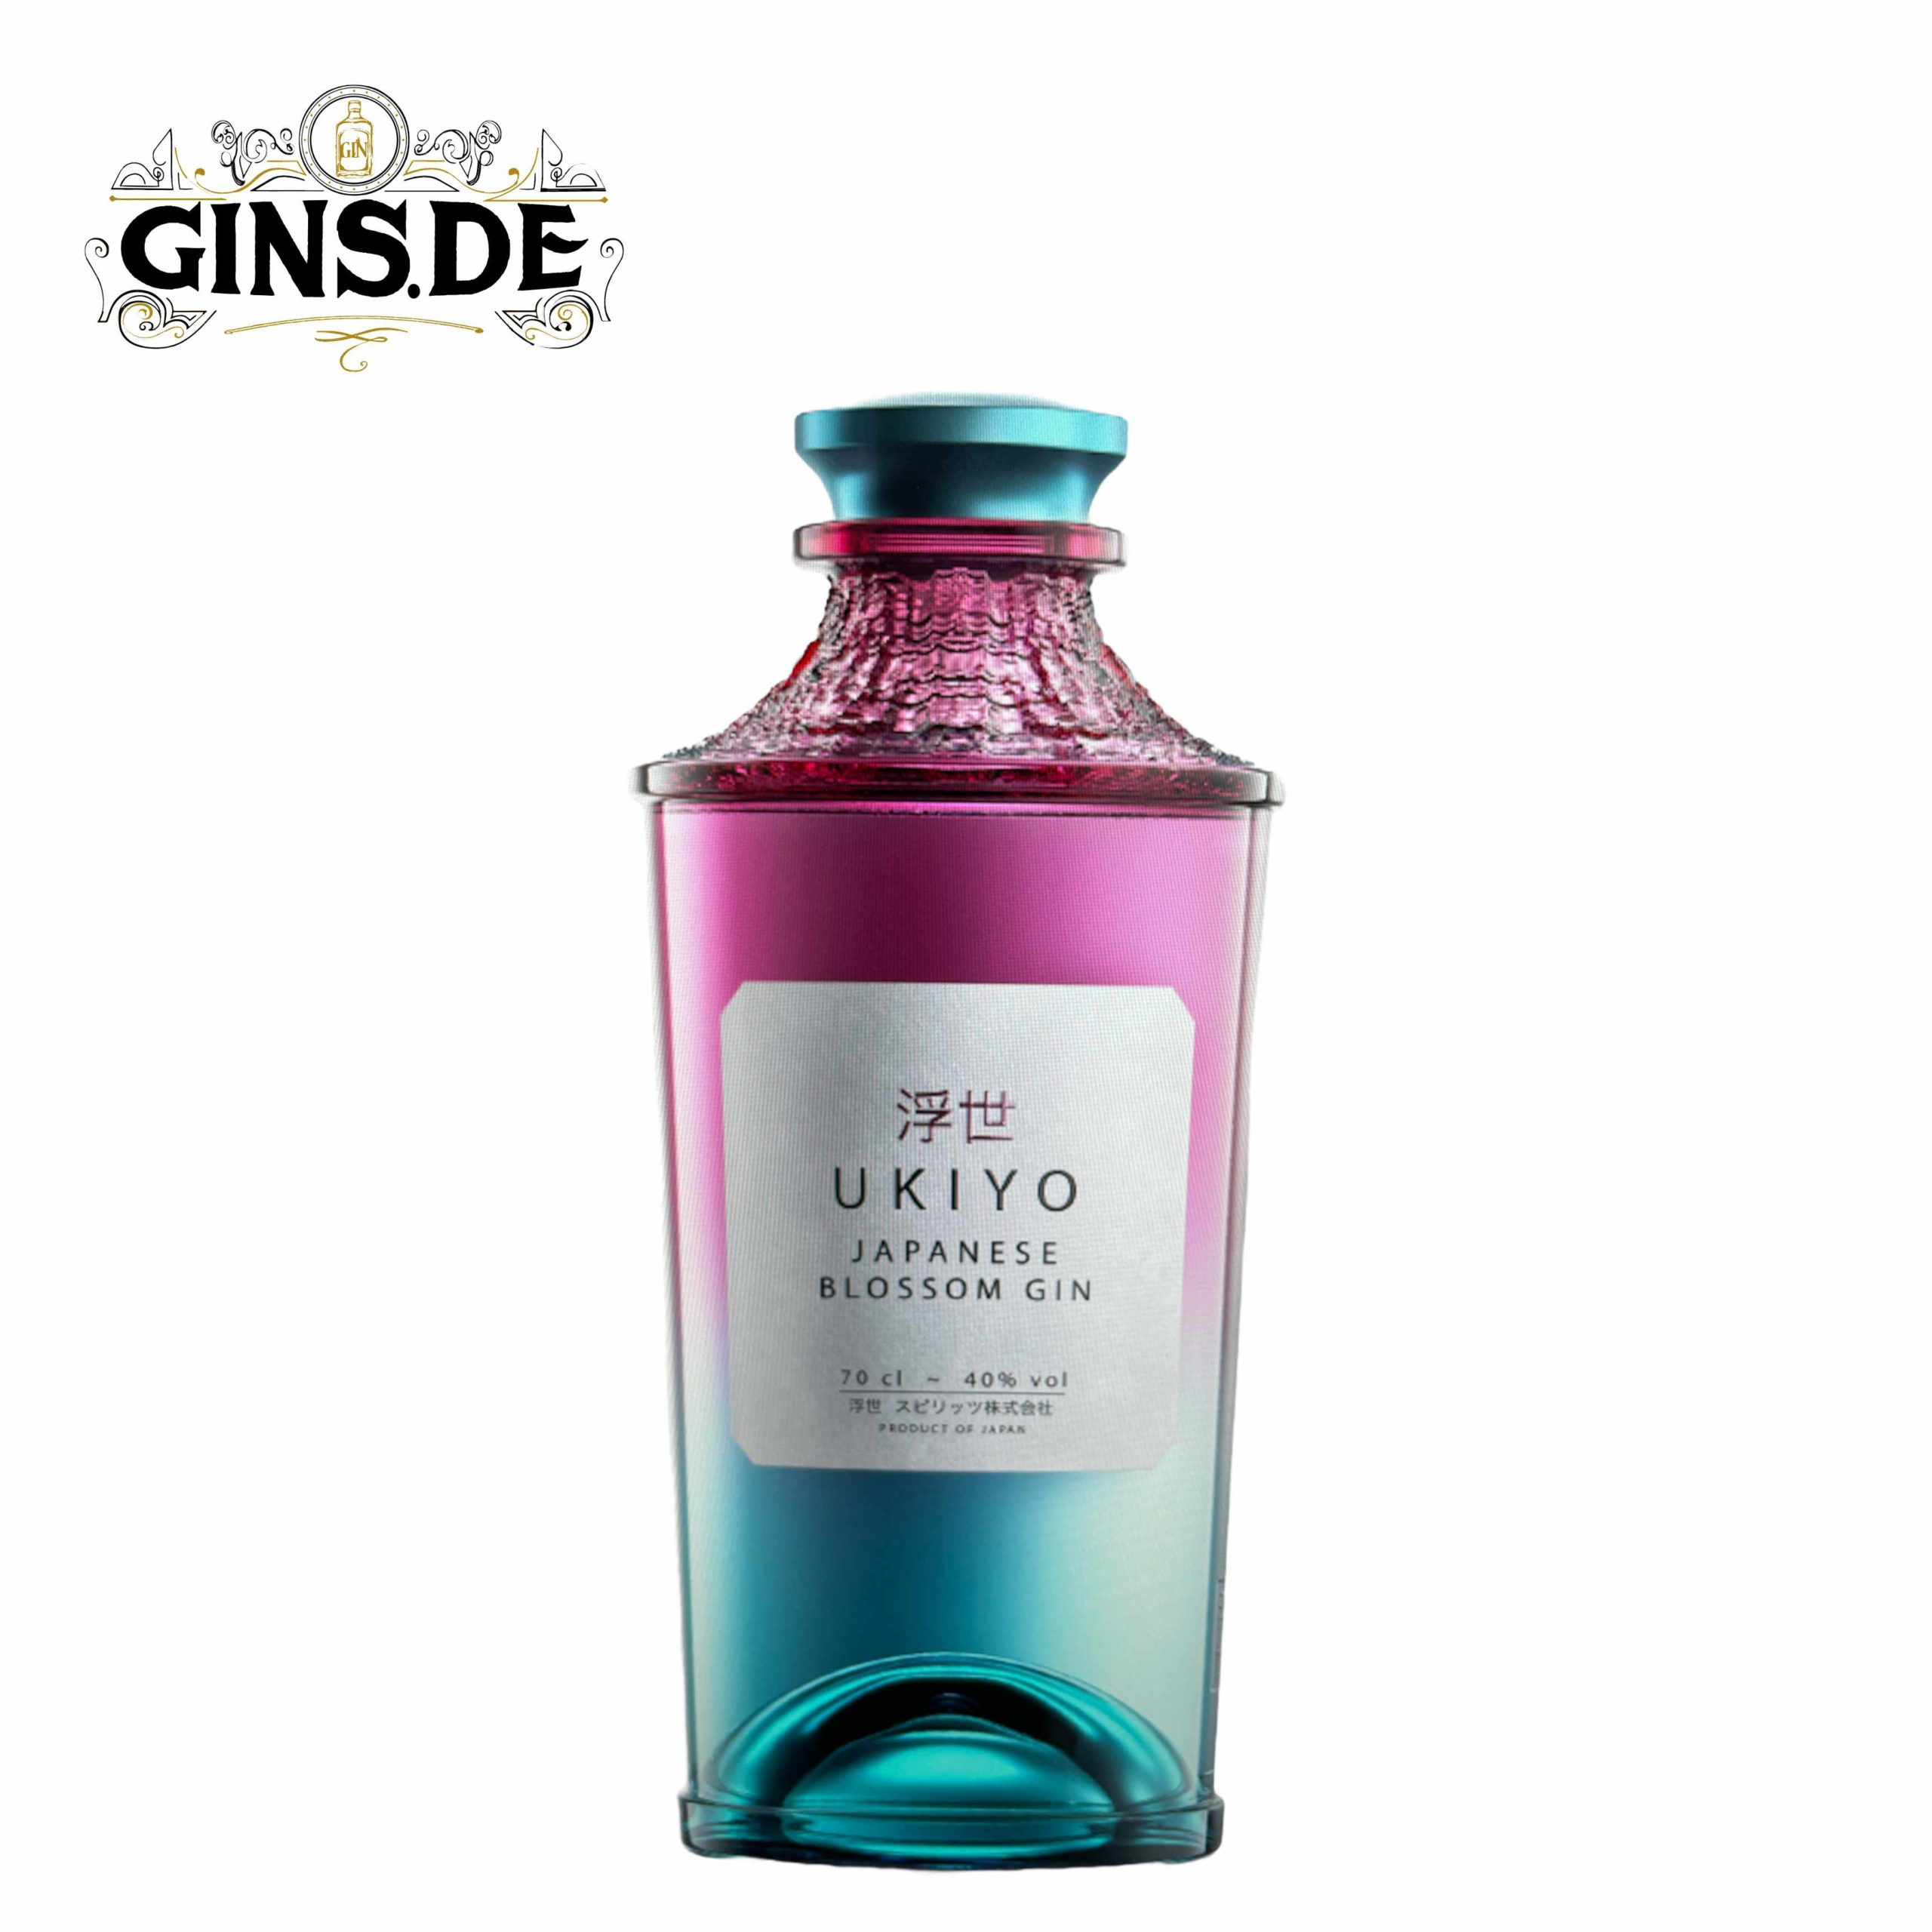 Flasche Ukiyo Japanese Blossom Gin